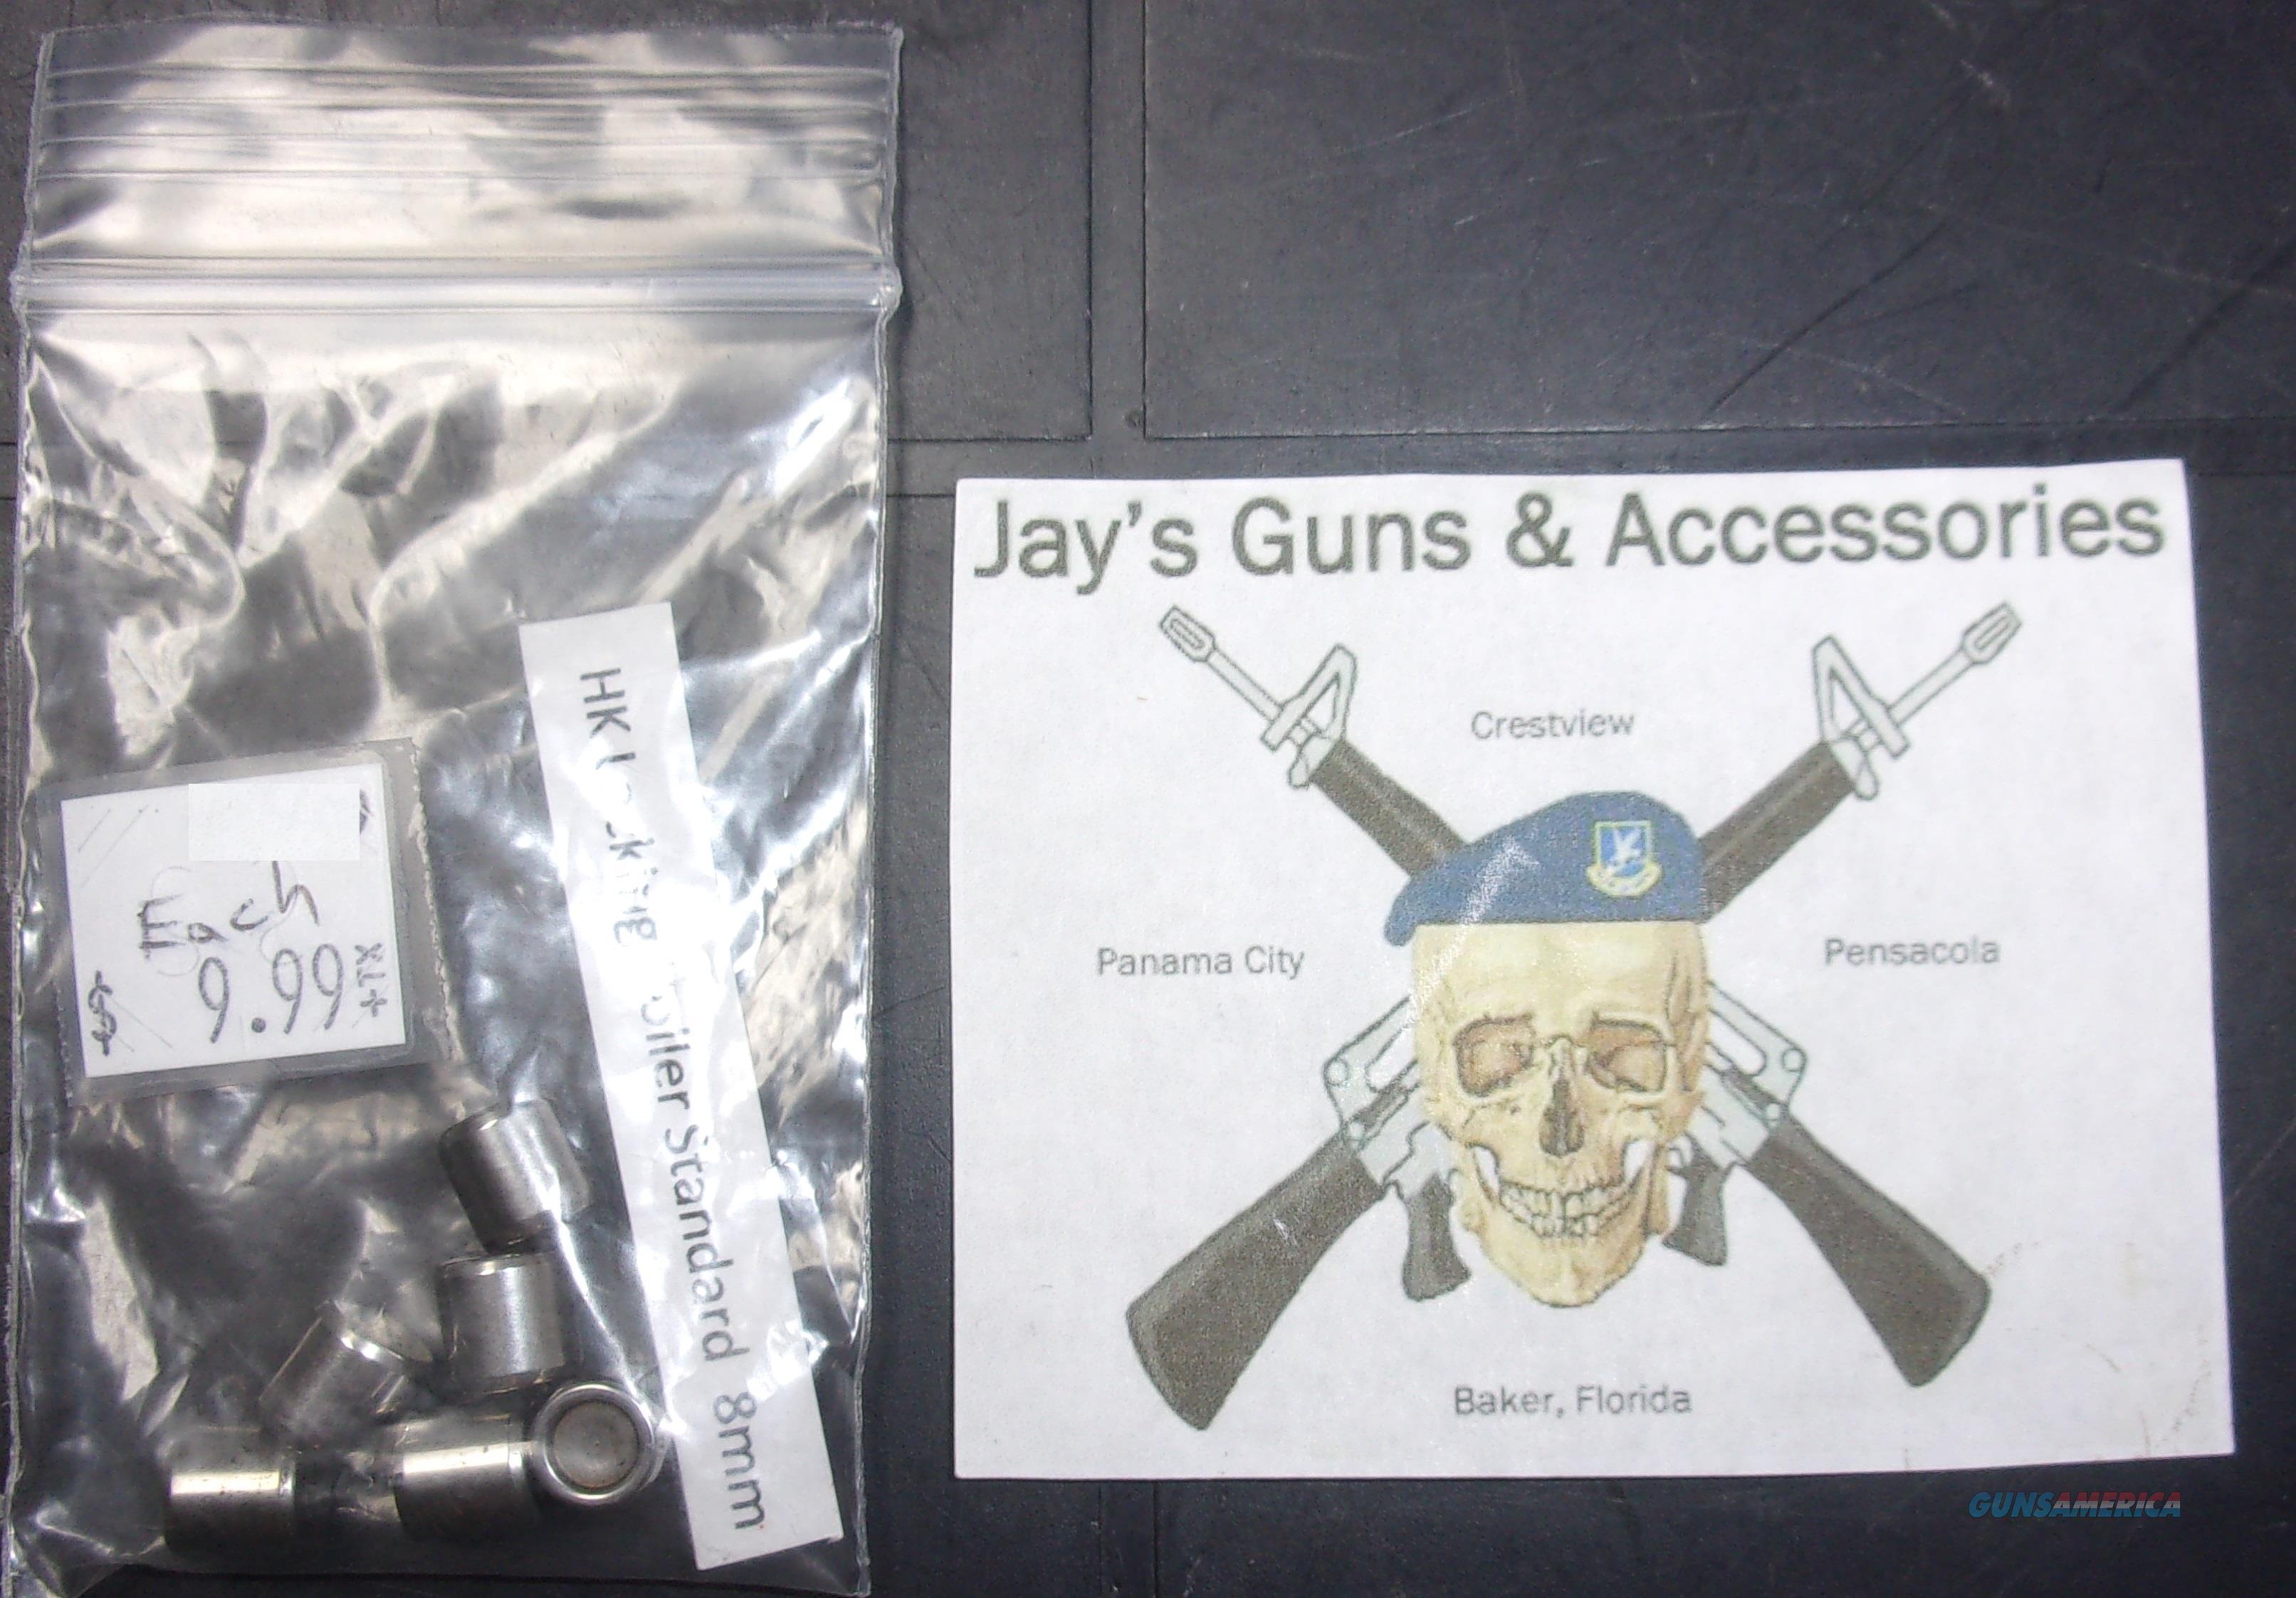 HK Locking Roller Standard 8mm  Non-Guns > Gun Parts > Rifle/Accuracy/Sniper